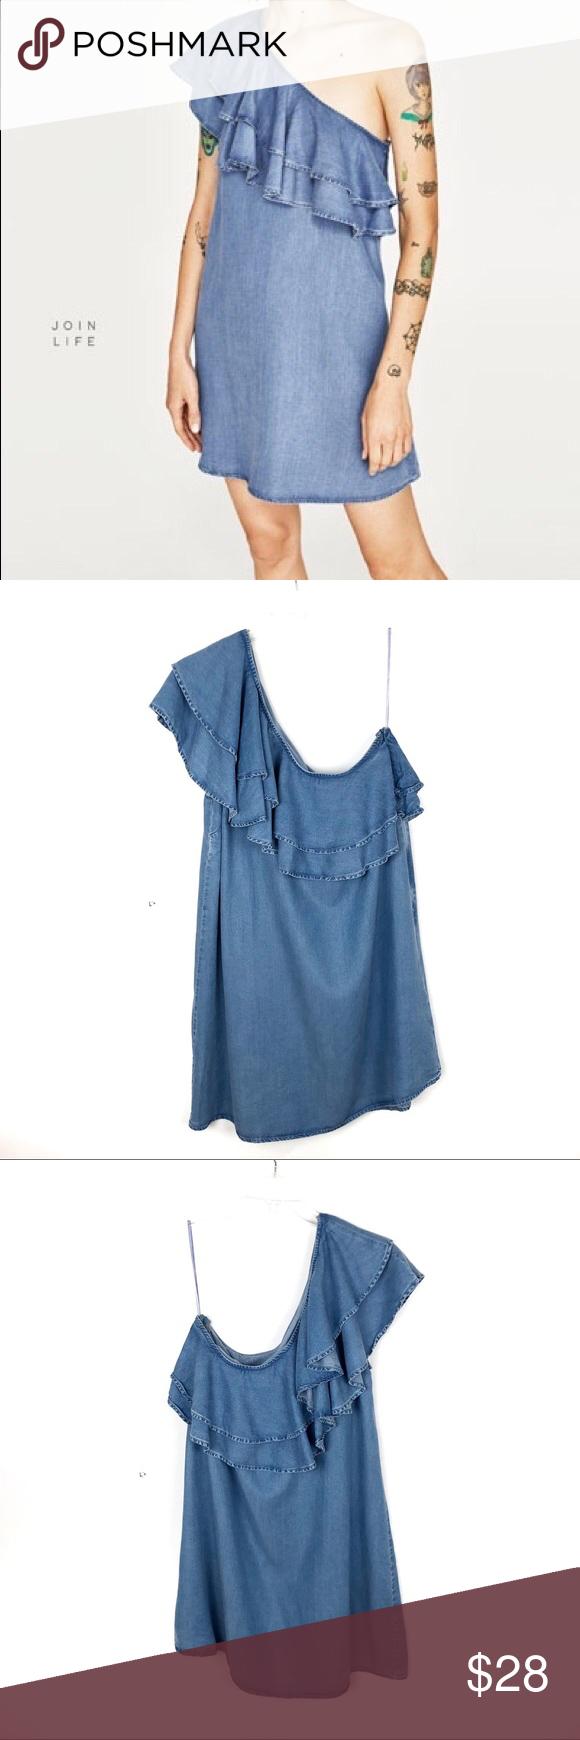 3 For 20 Zara One Shoulder Chambray Ruffle Dress Denim Ruffle Dress Premium Denim Clothes Design [ 1740 x 580 Pixel ]